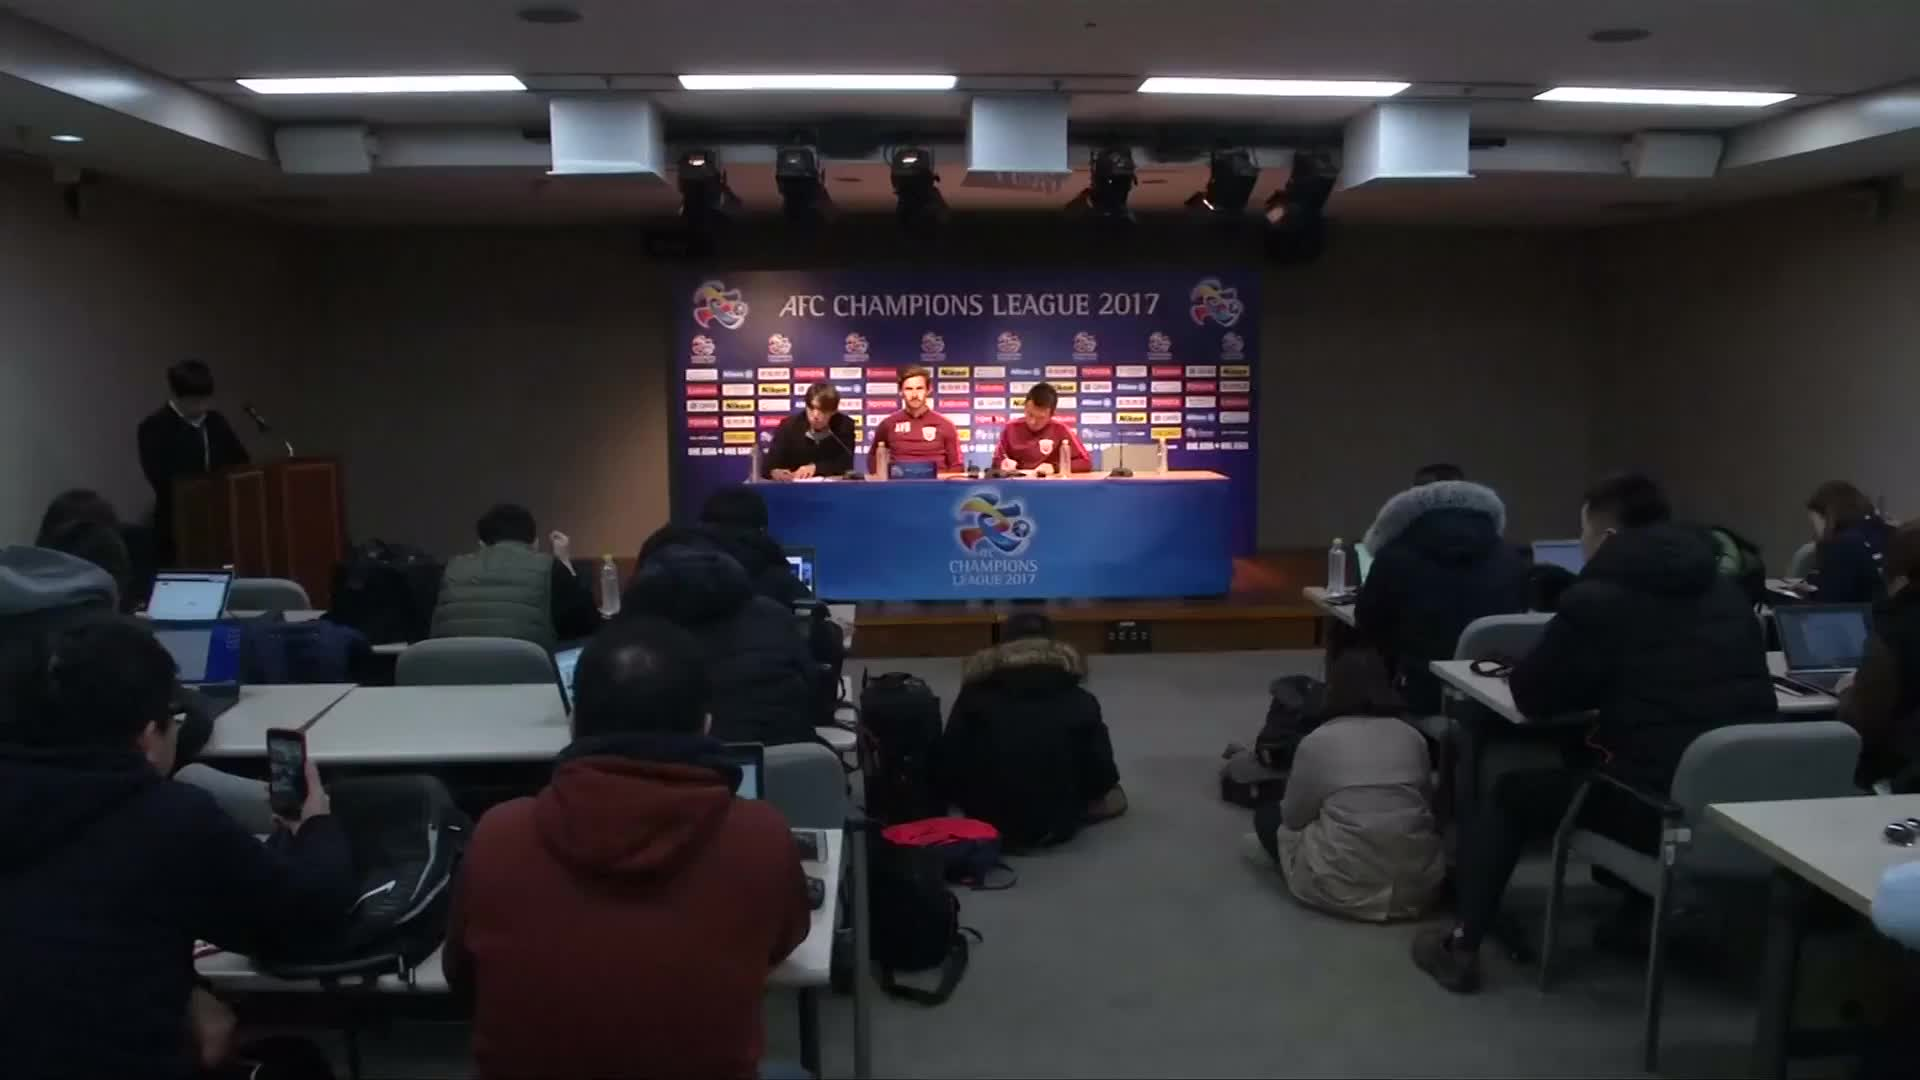 Shanghai SIPG stars Hulk and Oscar prepare for Asian Champions League match against FC Seoul